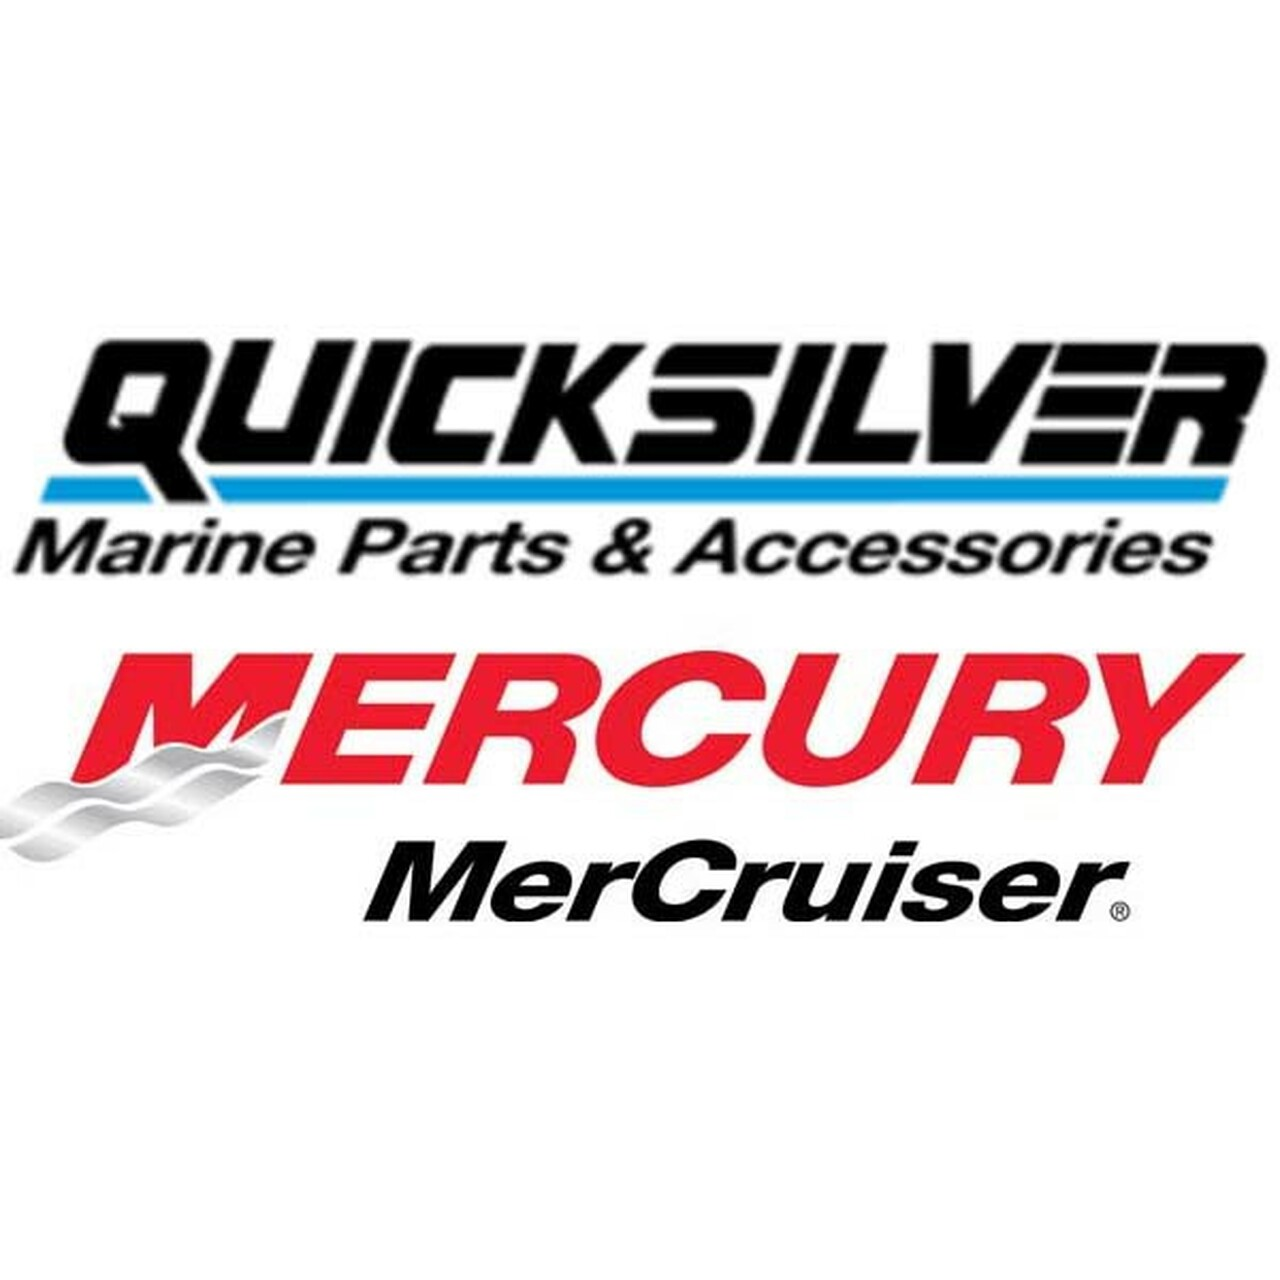 Mercury-Mercruiser 866170A01 Fuel Pump Kit